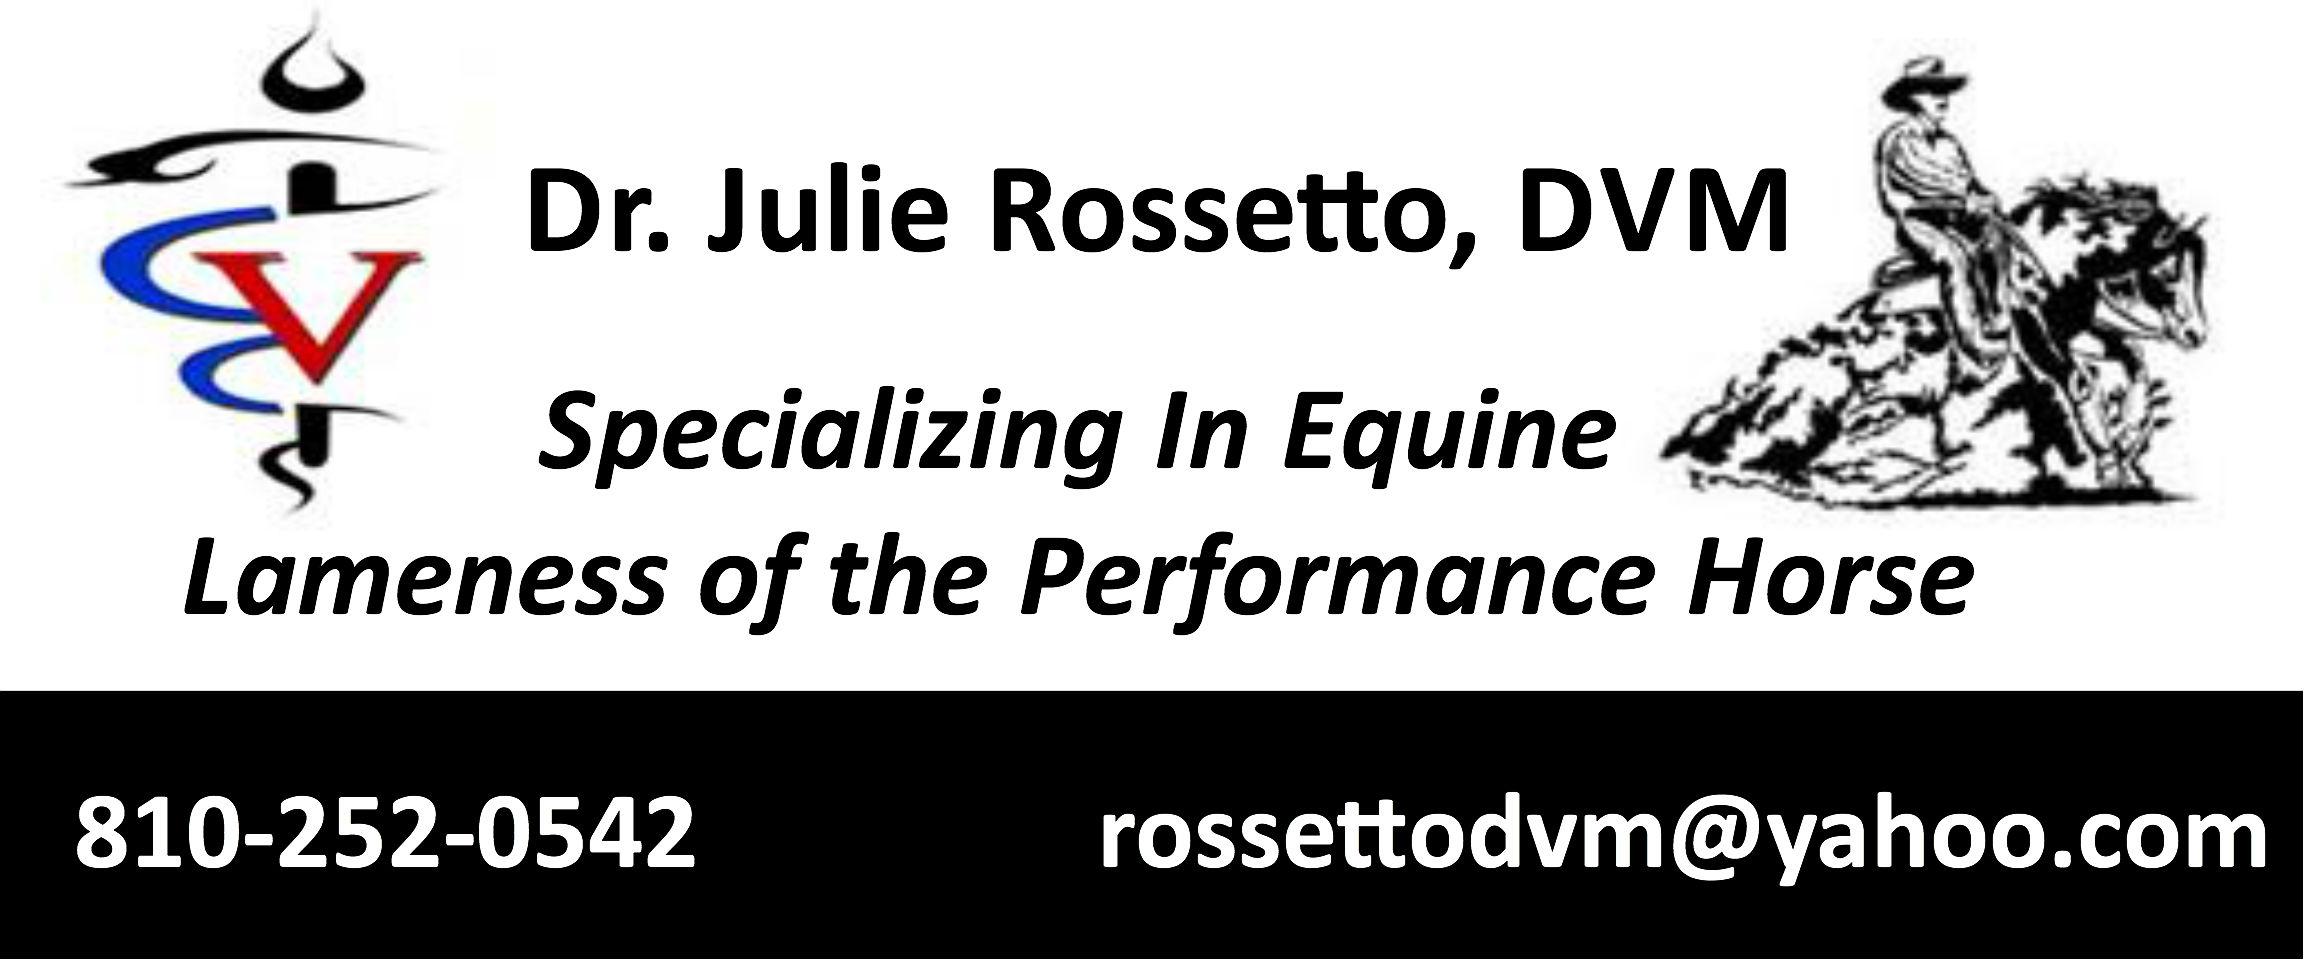 Dr Jule Rossetto, DVM